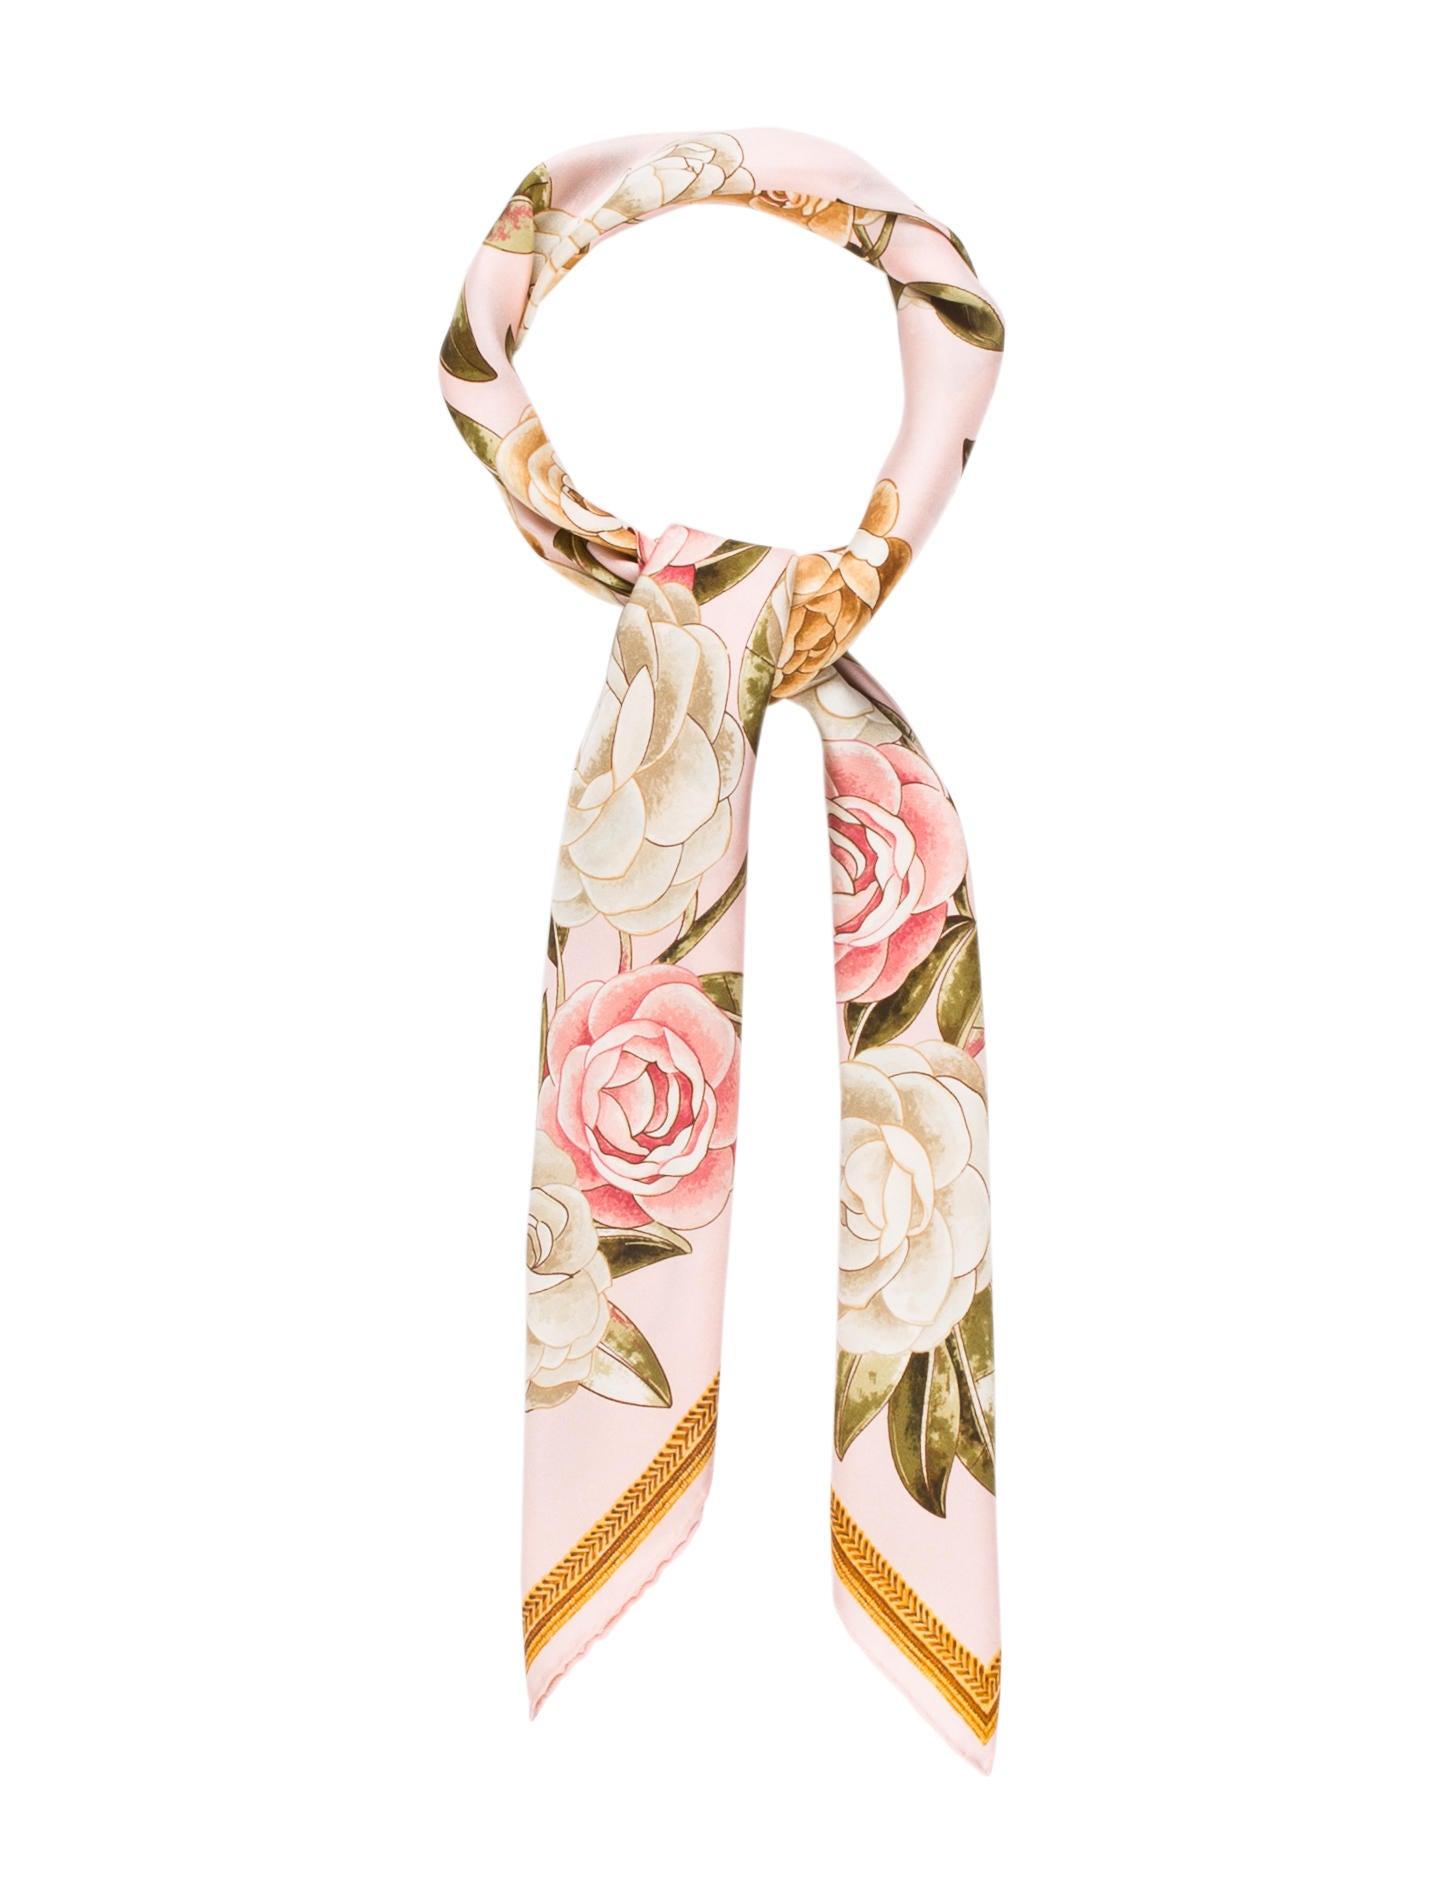 2d3fef267658 Chanel Camellia Silk Scarf - Accessories - CHA172752   The RealReal